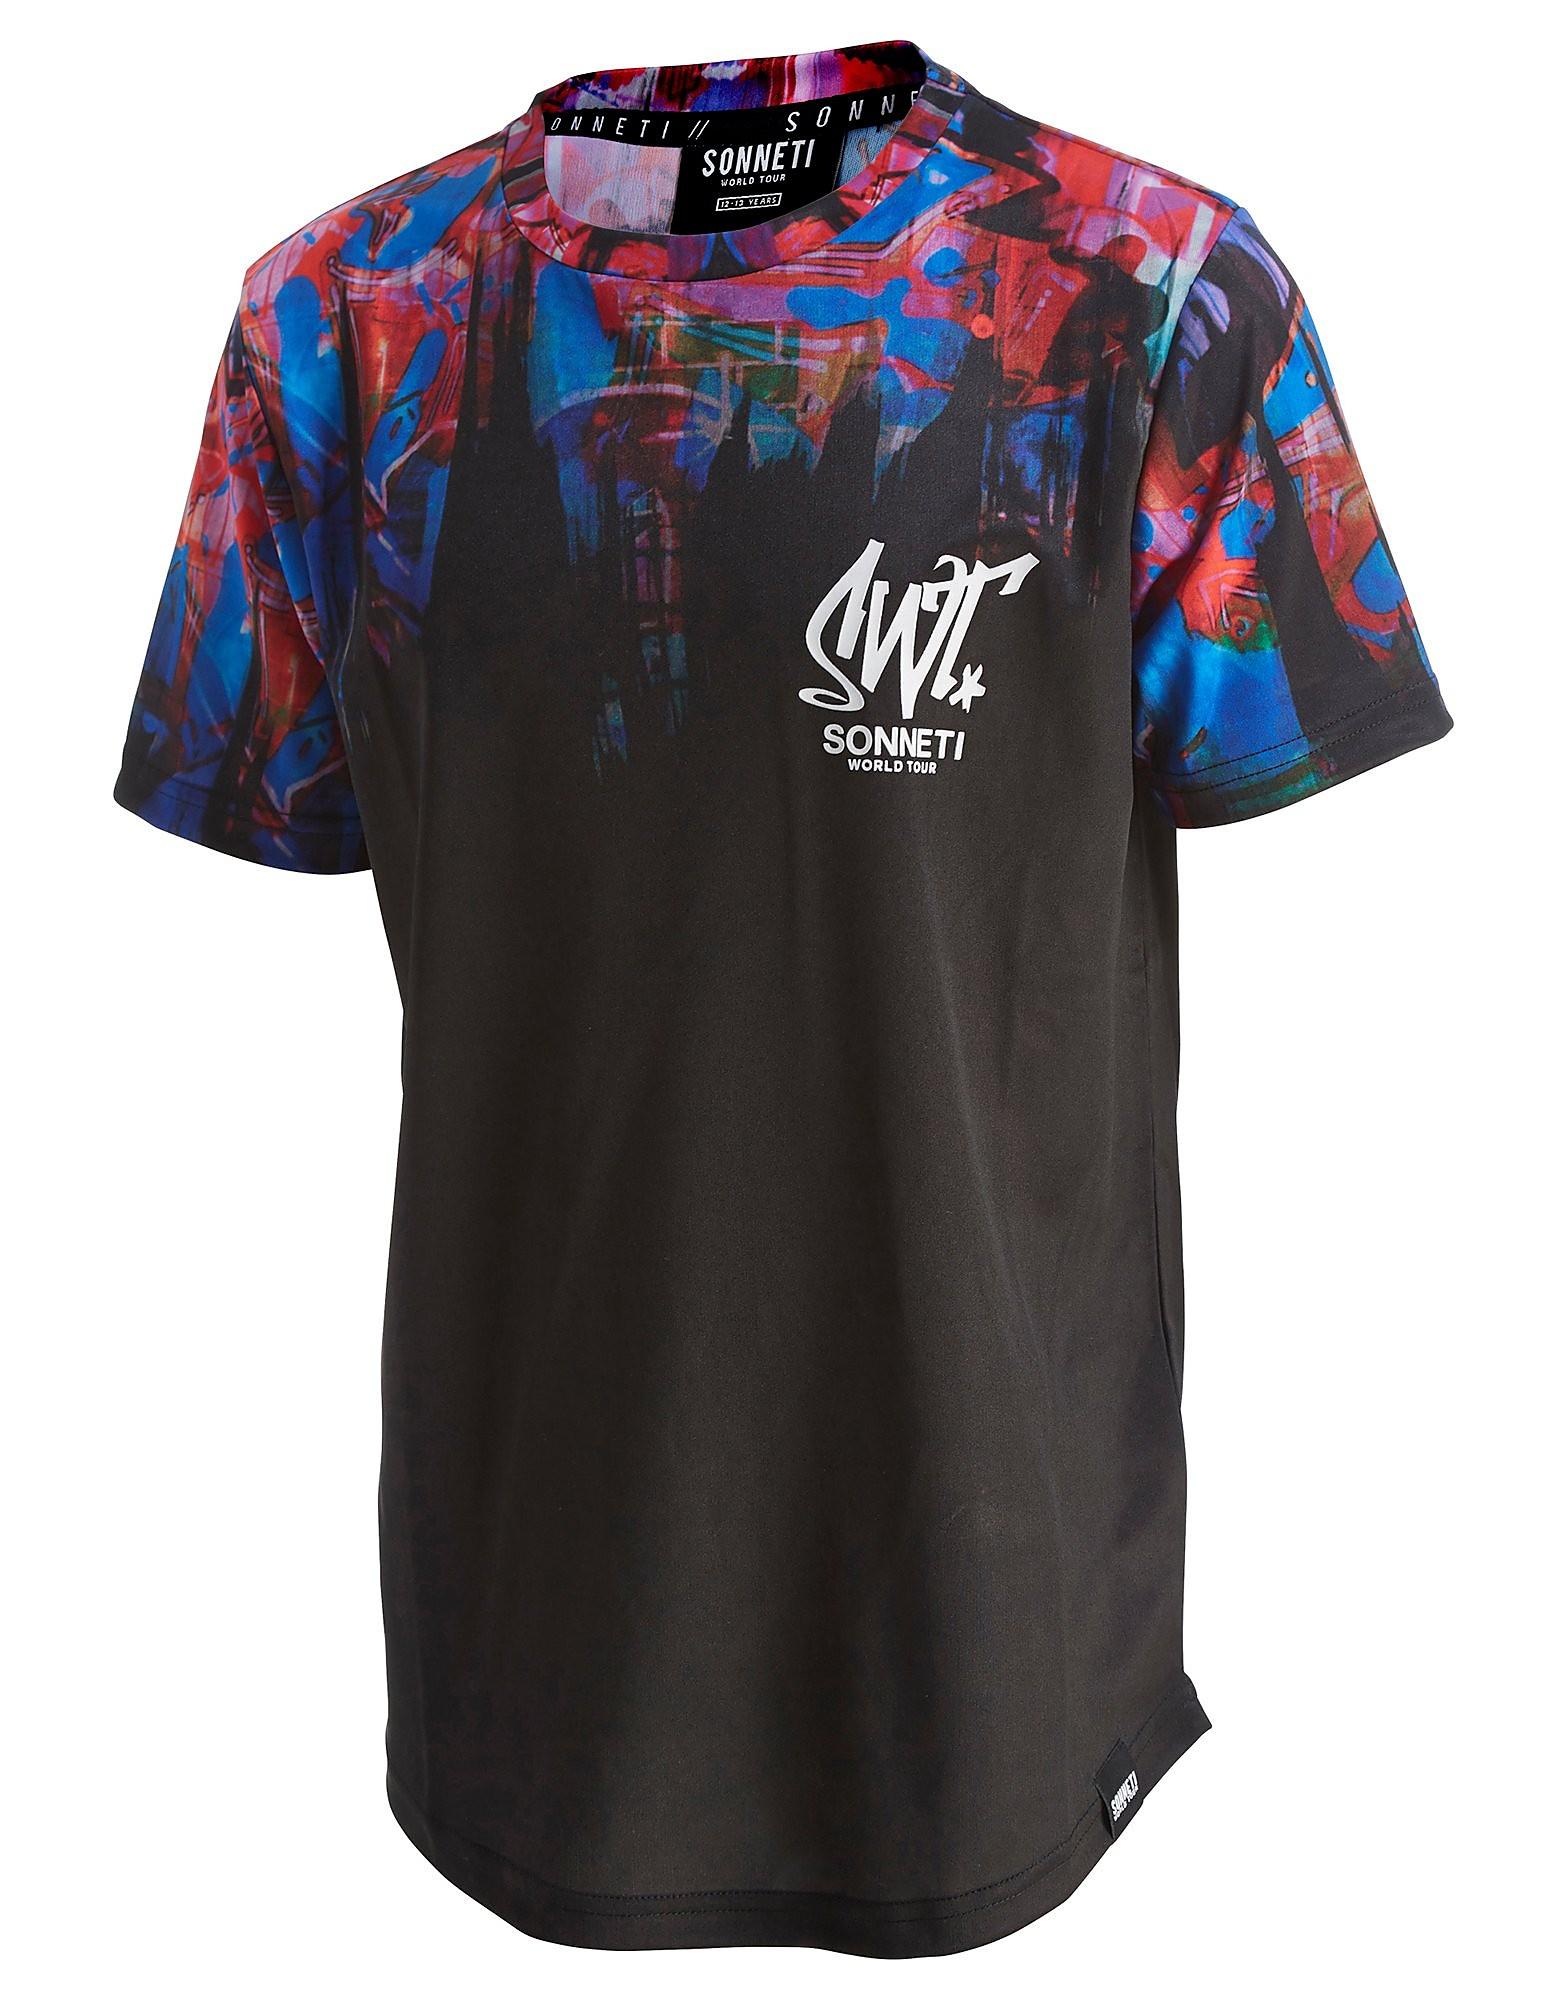 Sonneti Swish T-Shirt Junior